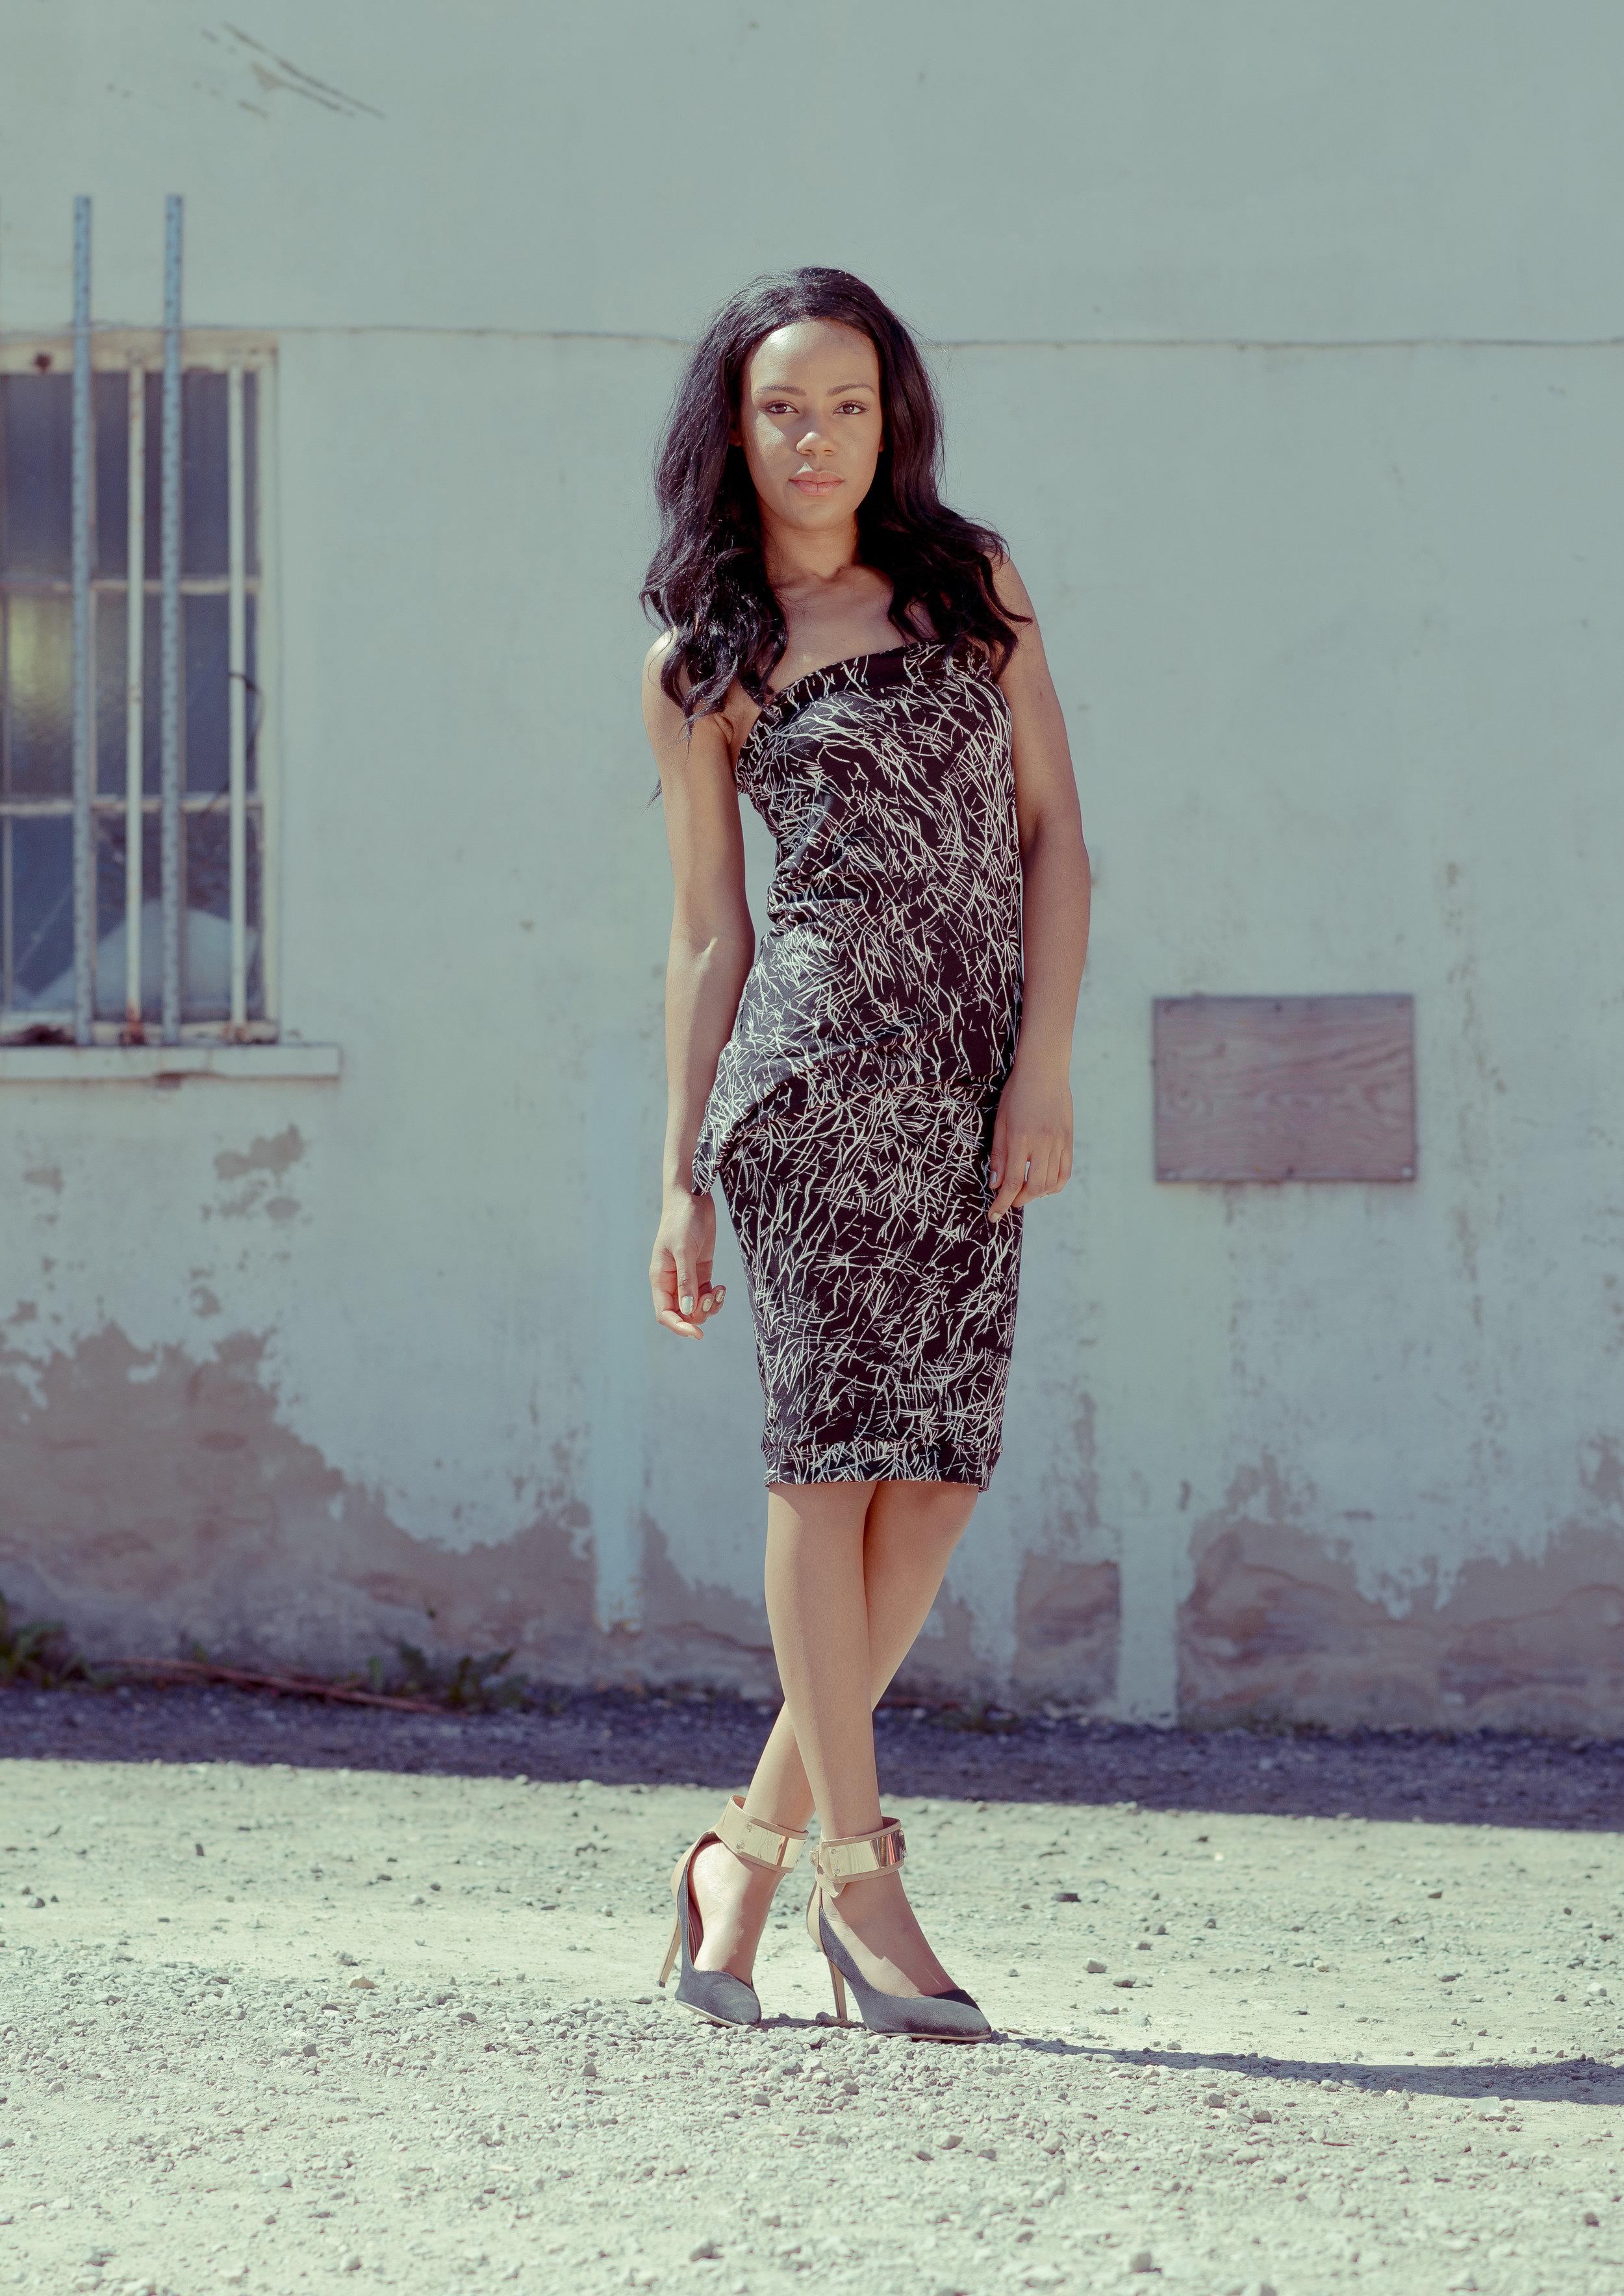 zaramia-ava-zaramiaava-leeds-fashion-designer-ethical-sustainable-tailored-minimalist-crop-top-black-print-point-skirt-black-jacket-belt-versatile-drape-cowl-styling-womenswear-models-14